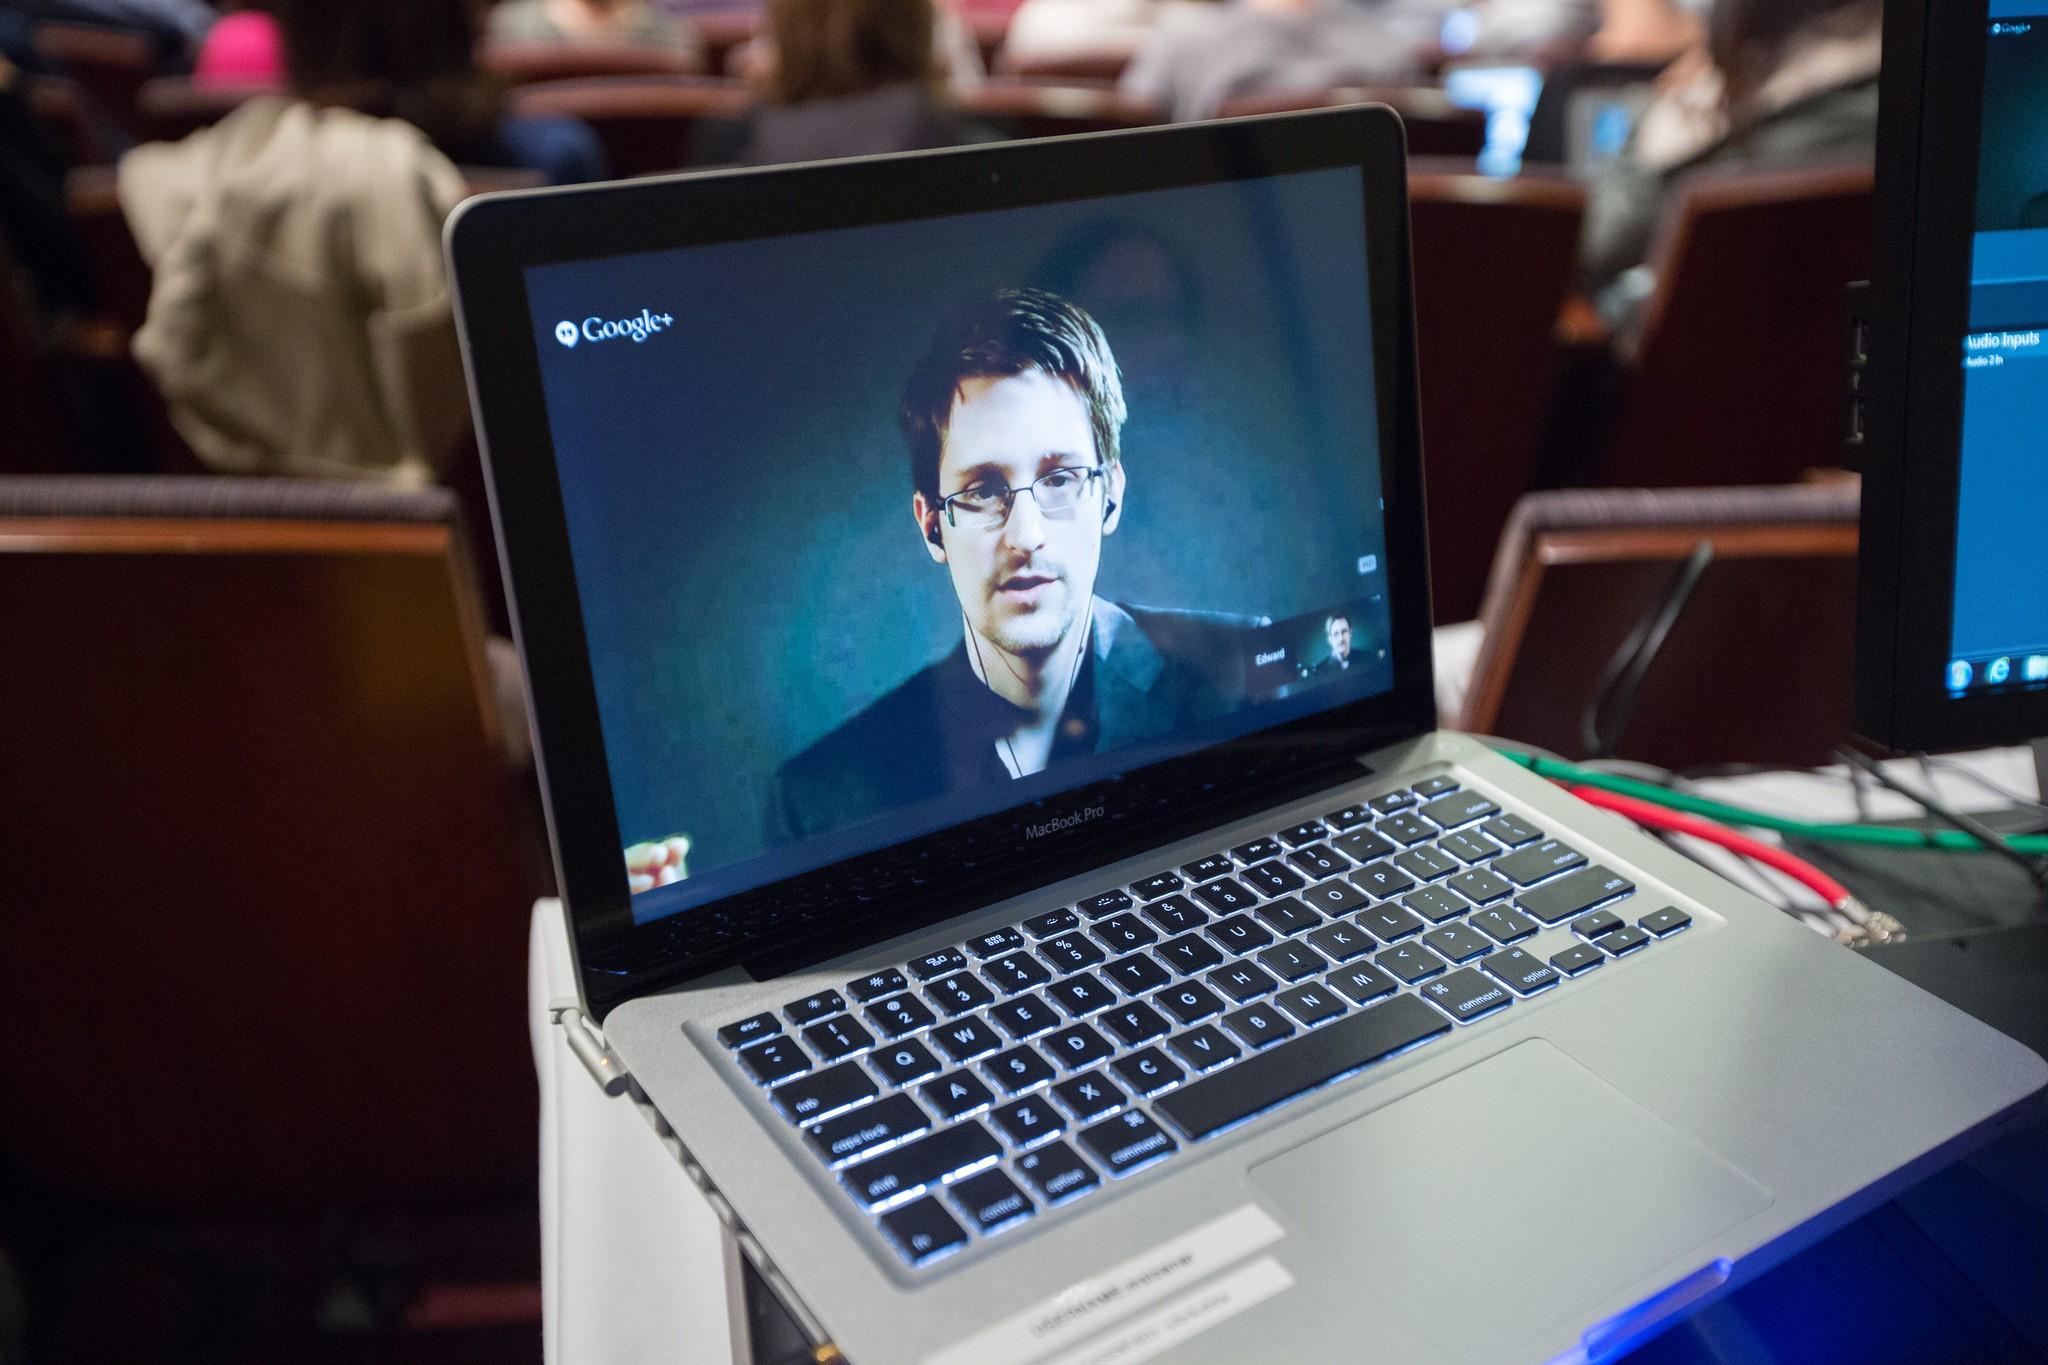 Snowden's Favorite Cloud Service Now Has a Group Chat App